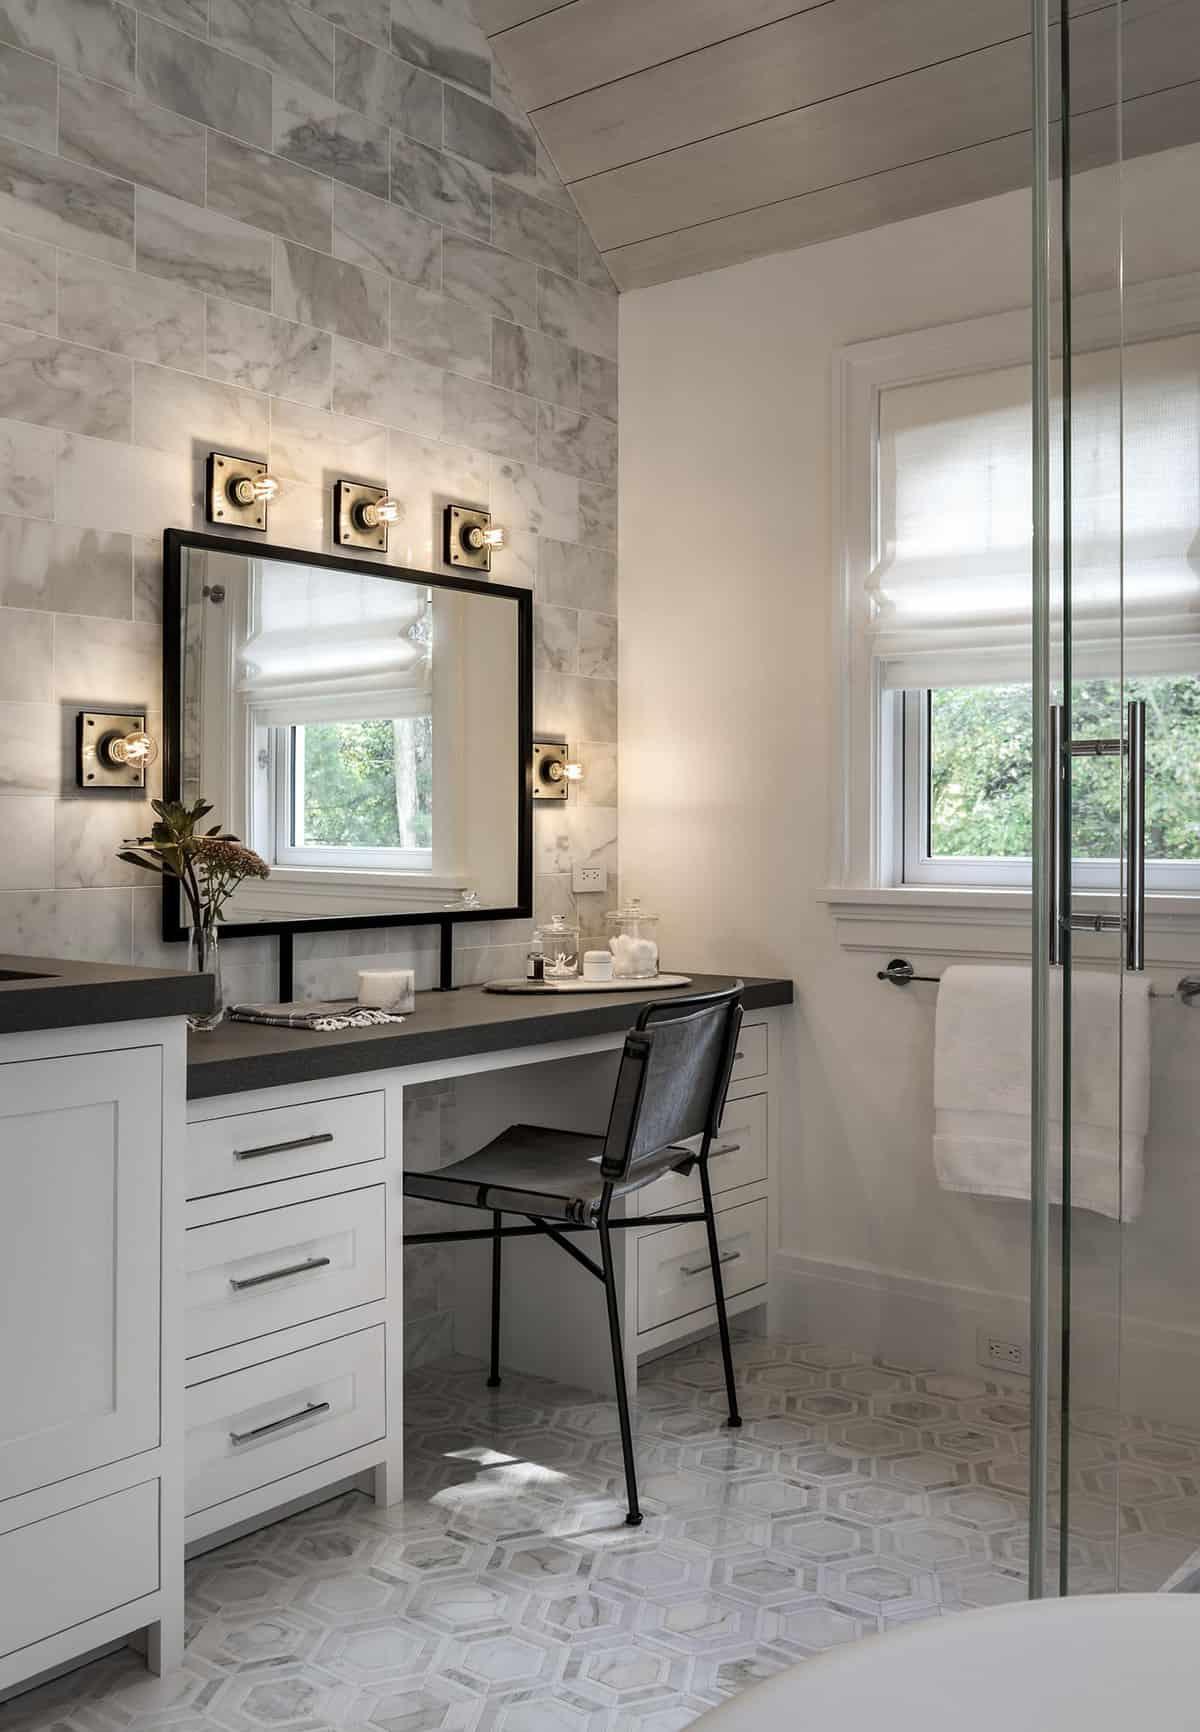 interior-renovation-transitional-bathroom-with-makeup-vanity